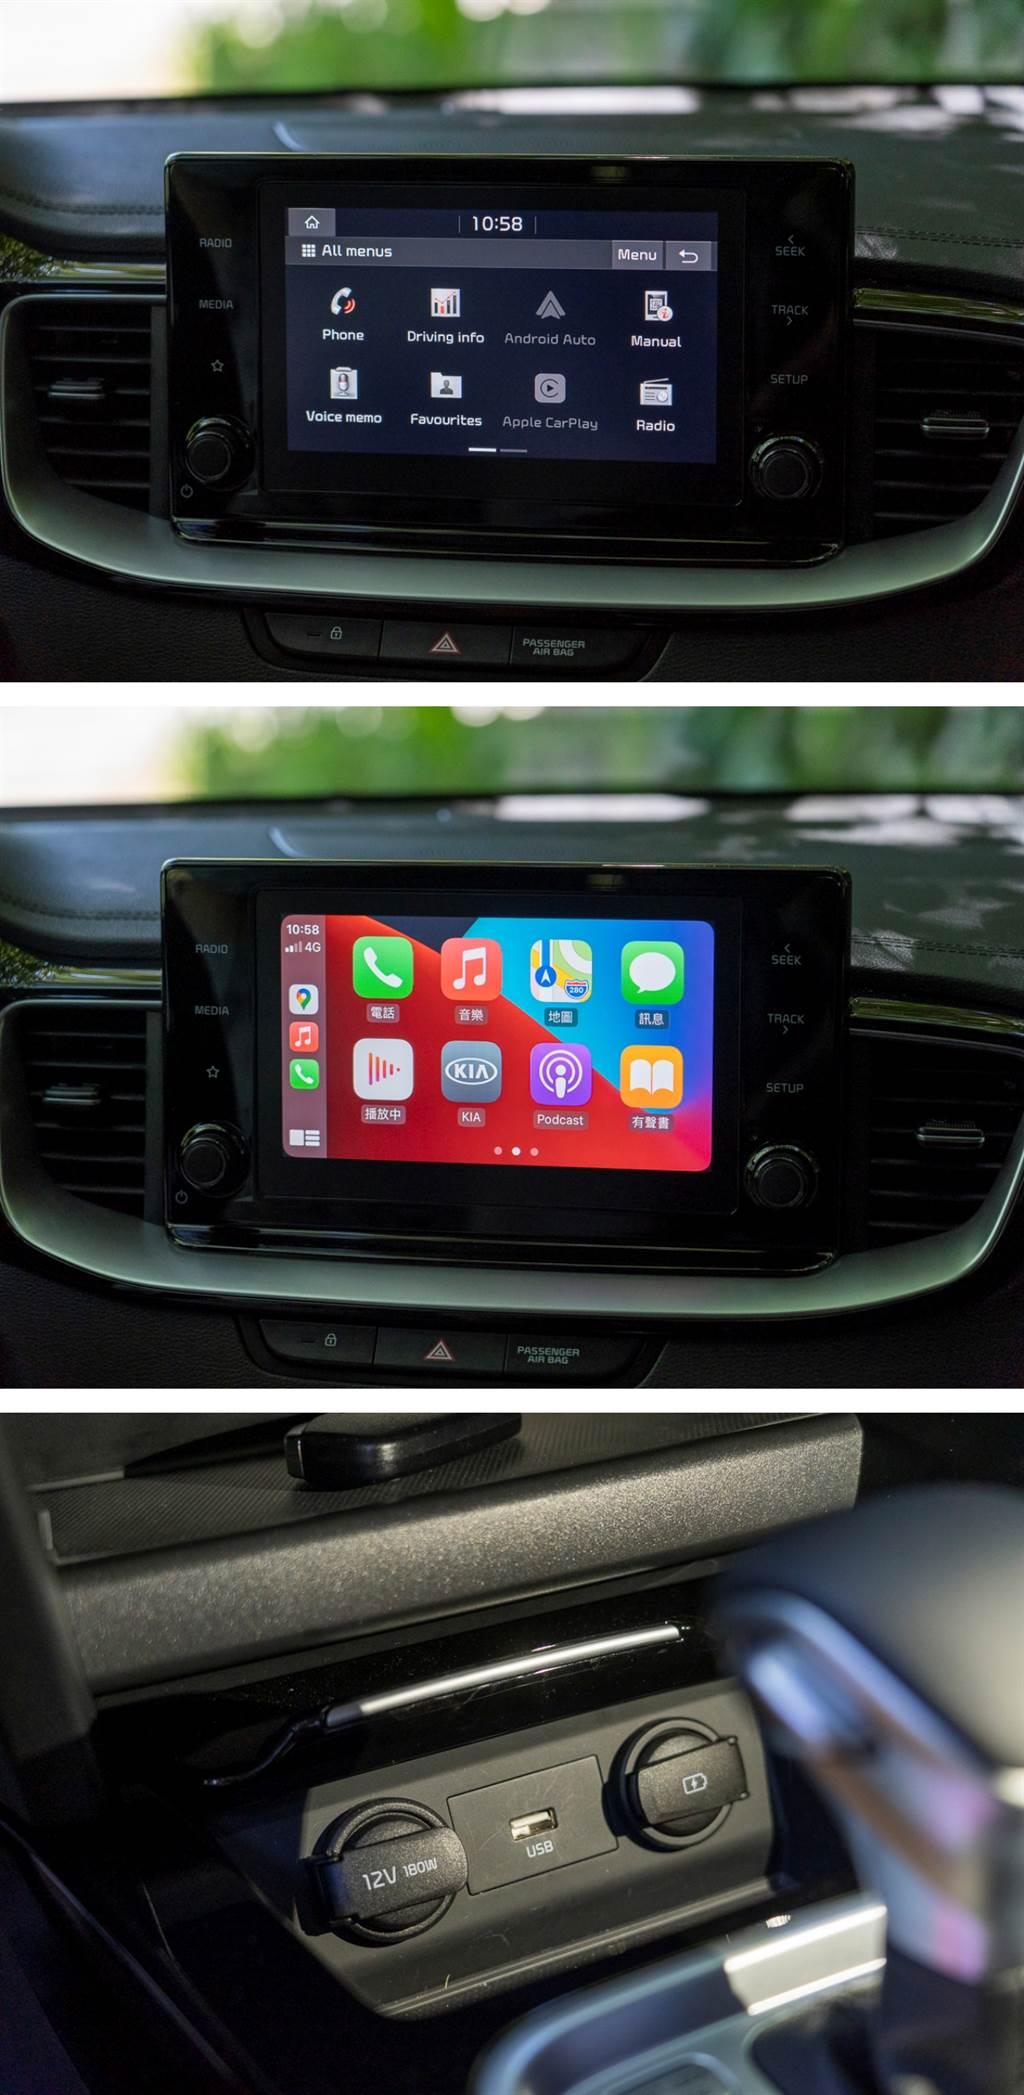 Ceed Sportwagon的中控下方處供應了各式電源接孔,但唯有中央的USB接頭提供Apple CarPlay、Android Auto的訊號轉換。(圖/CarStuff)